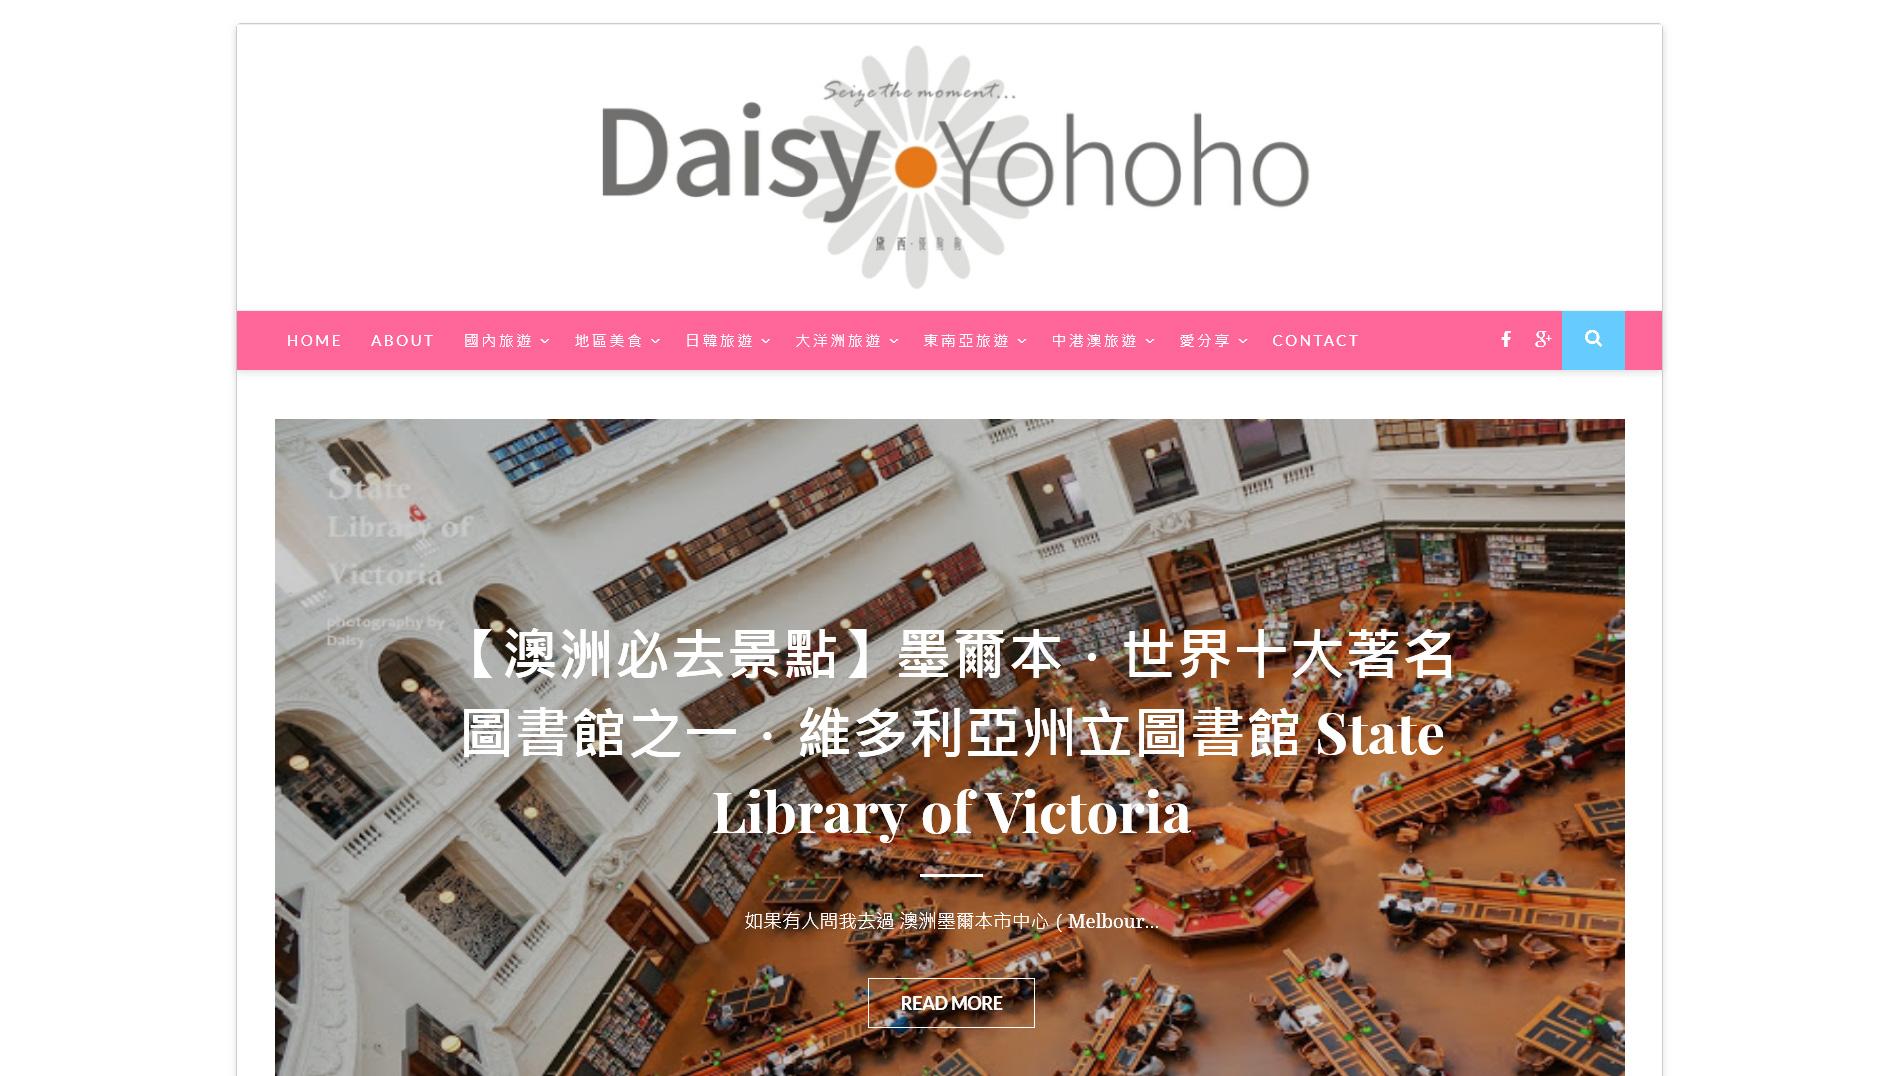 Home1-Daisy-Yohoho-hibabino